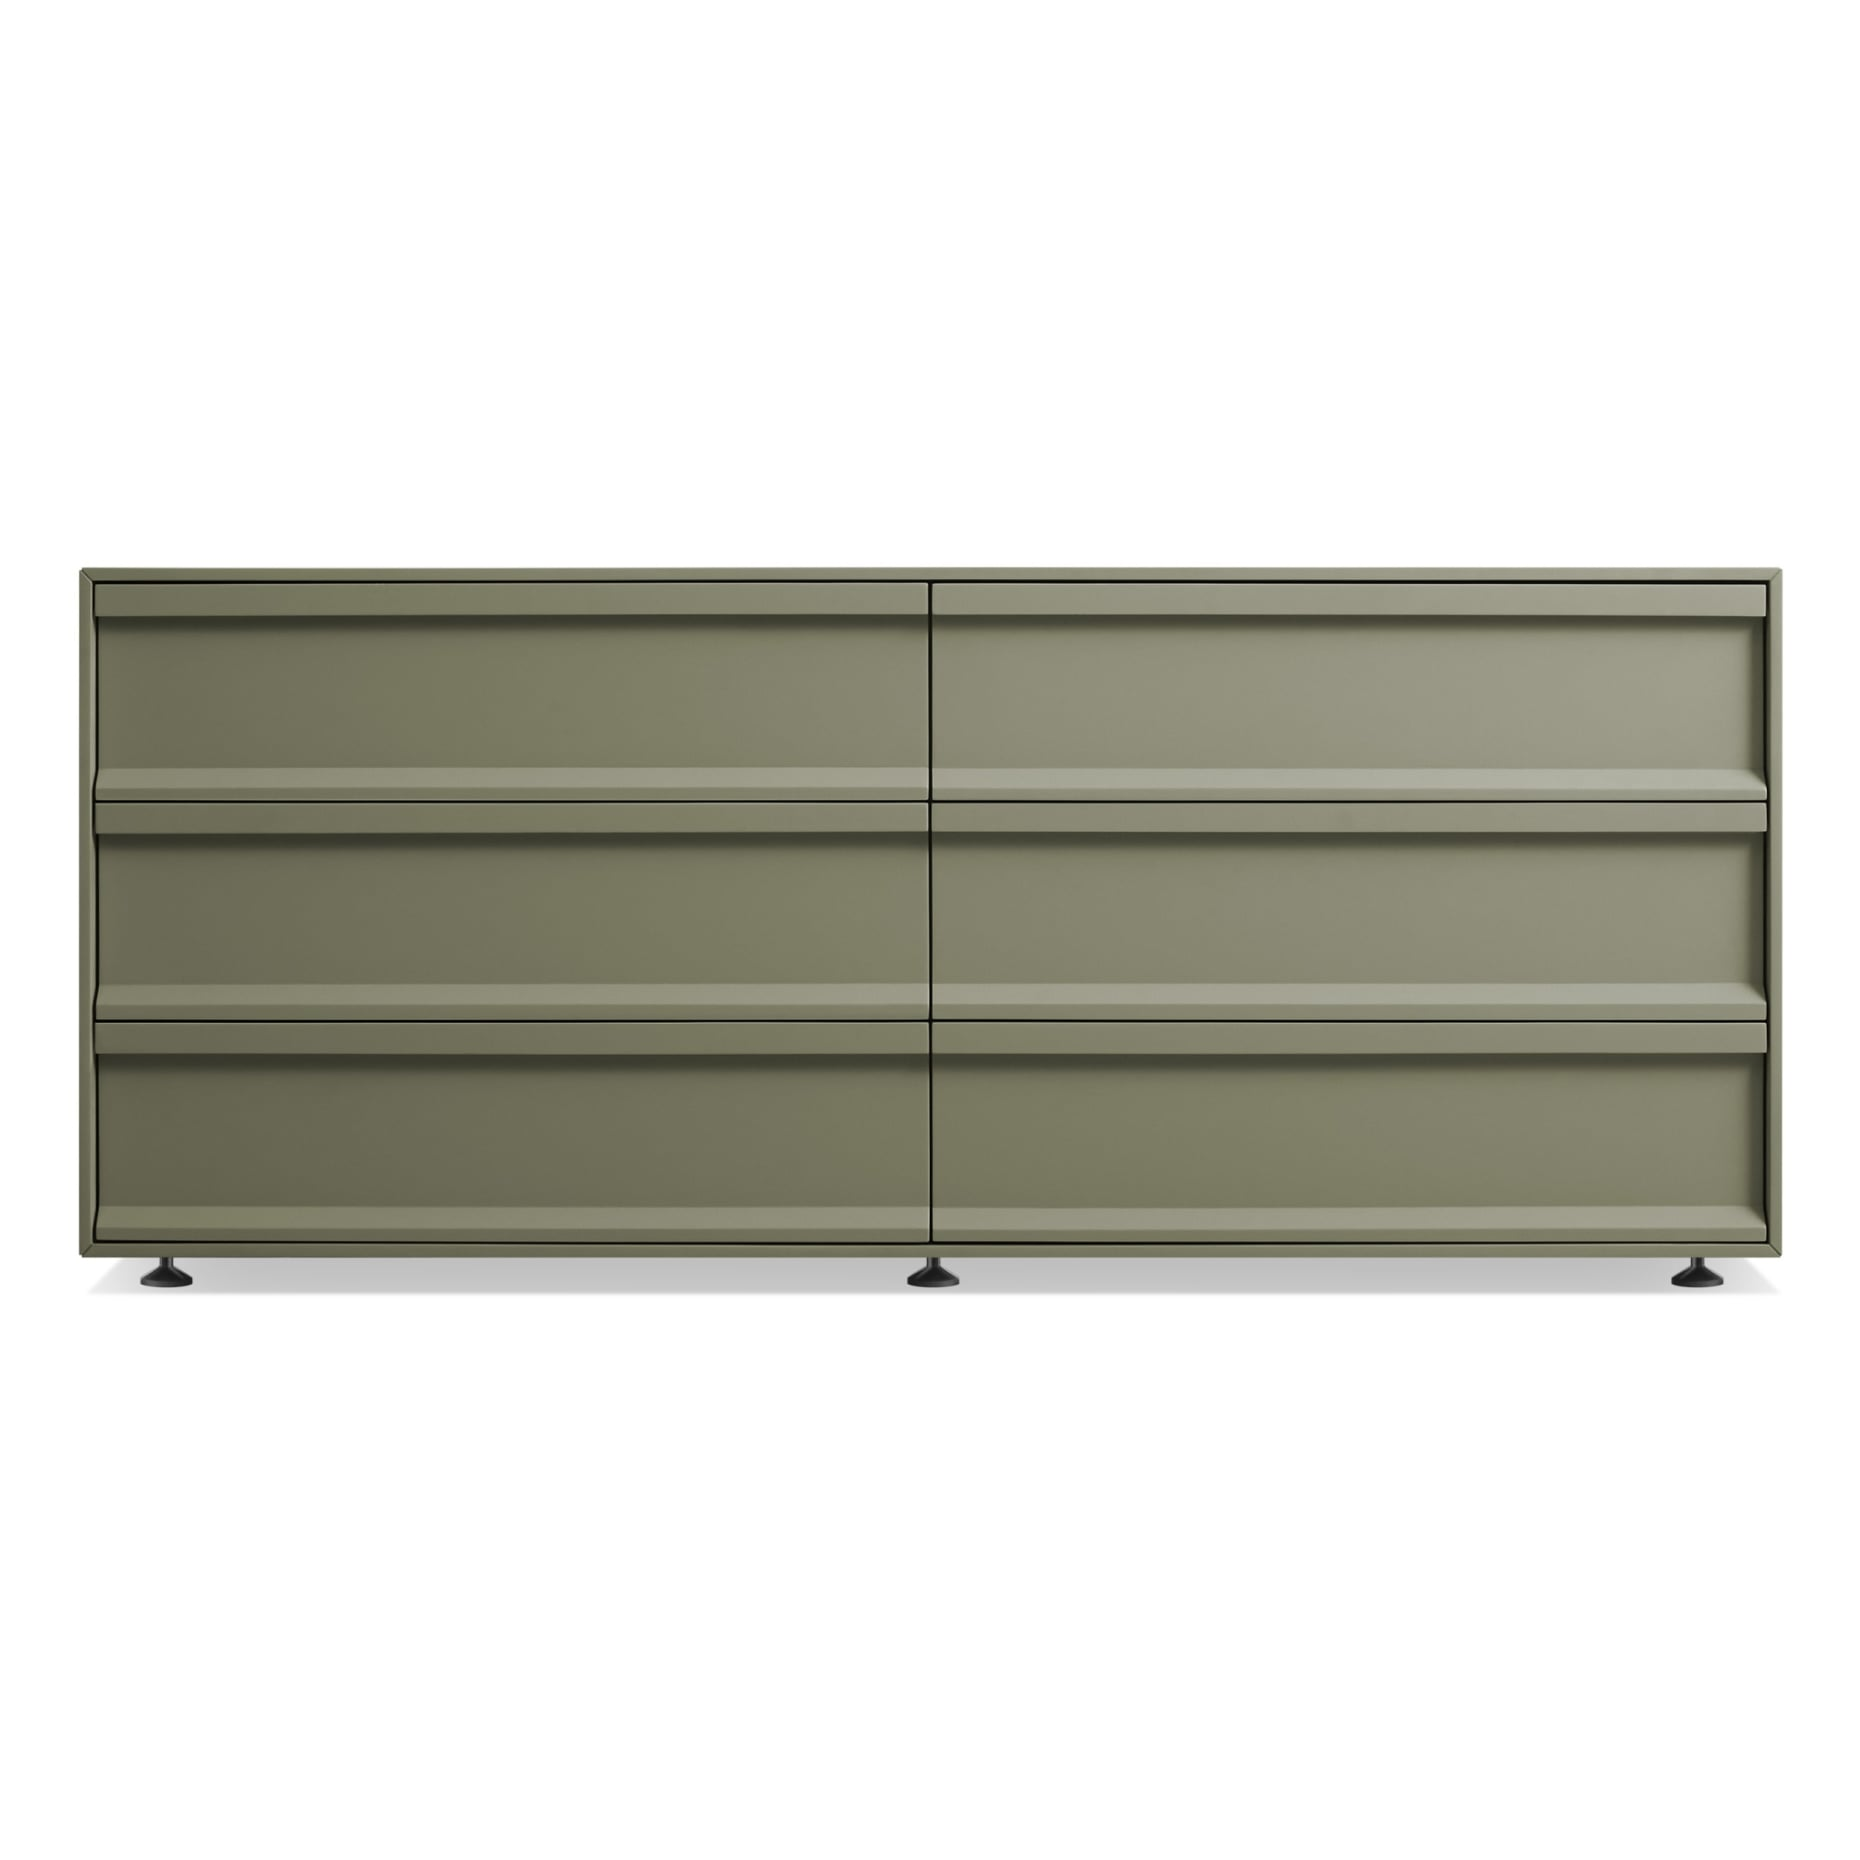 sc1 6drawr gg superchoice 6 drawer dresser grey green